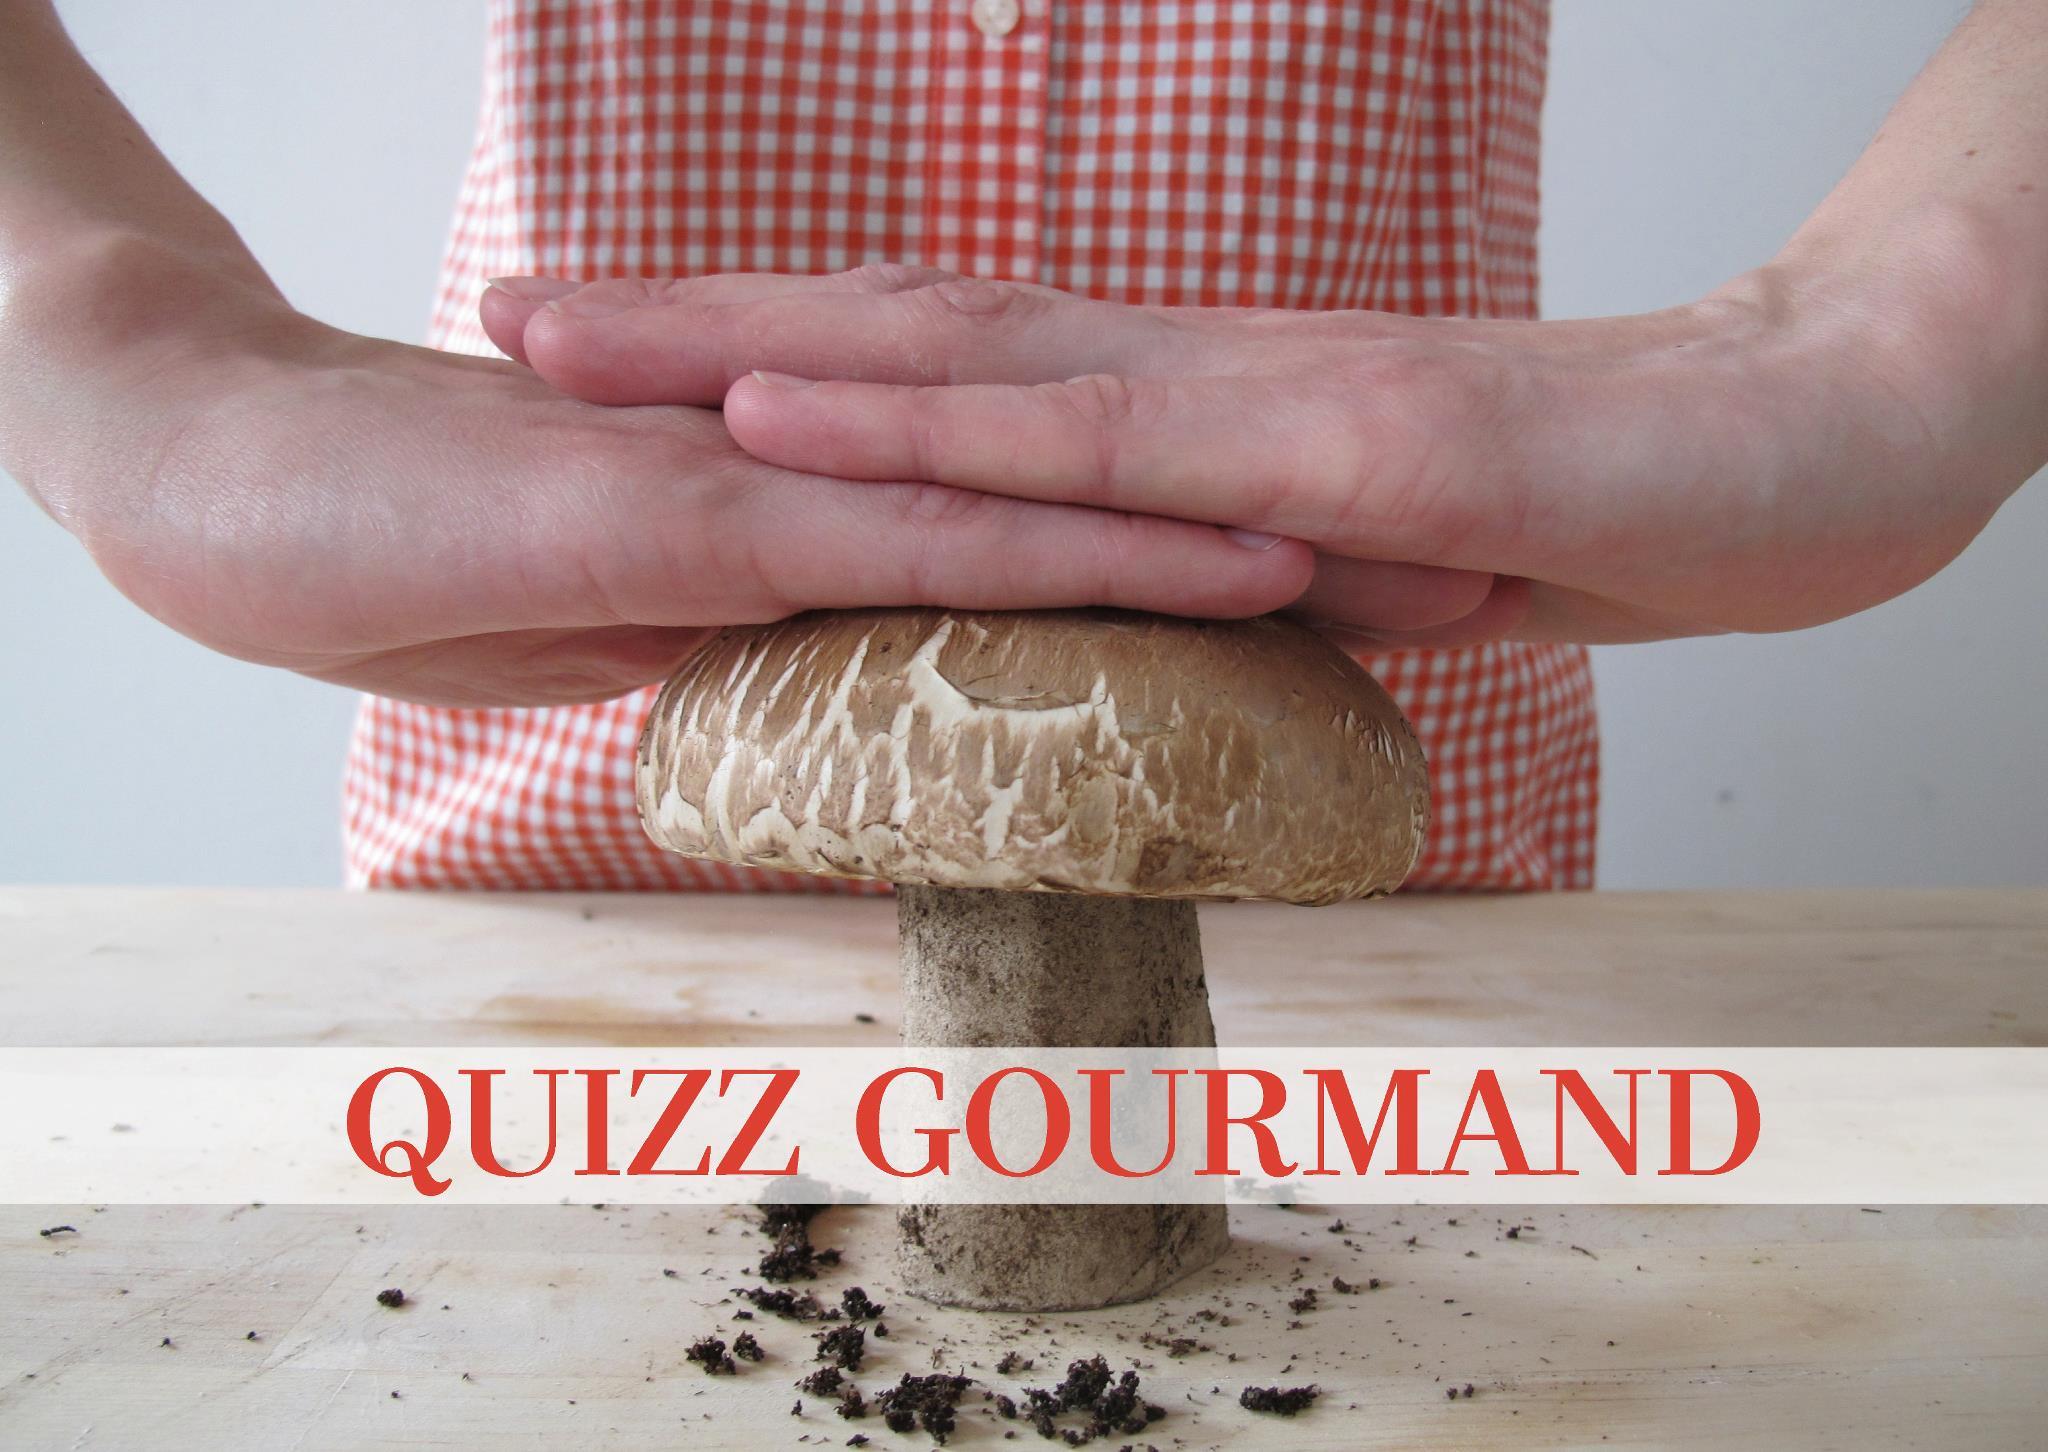 quizz gourmand | sain et gourmand